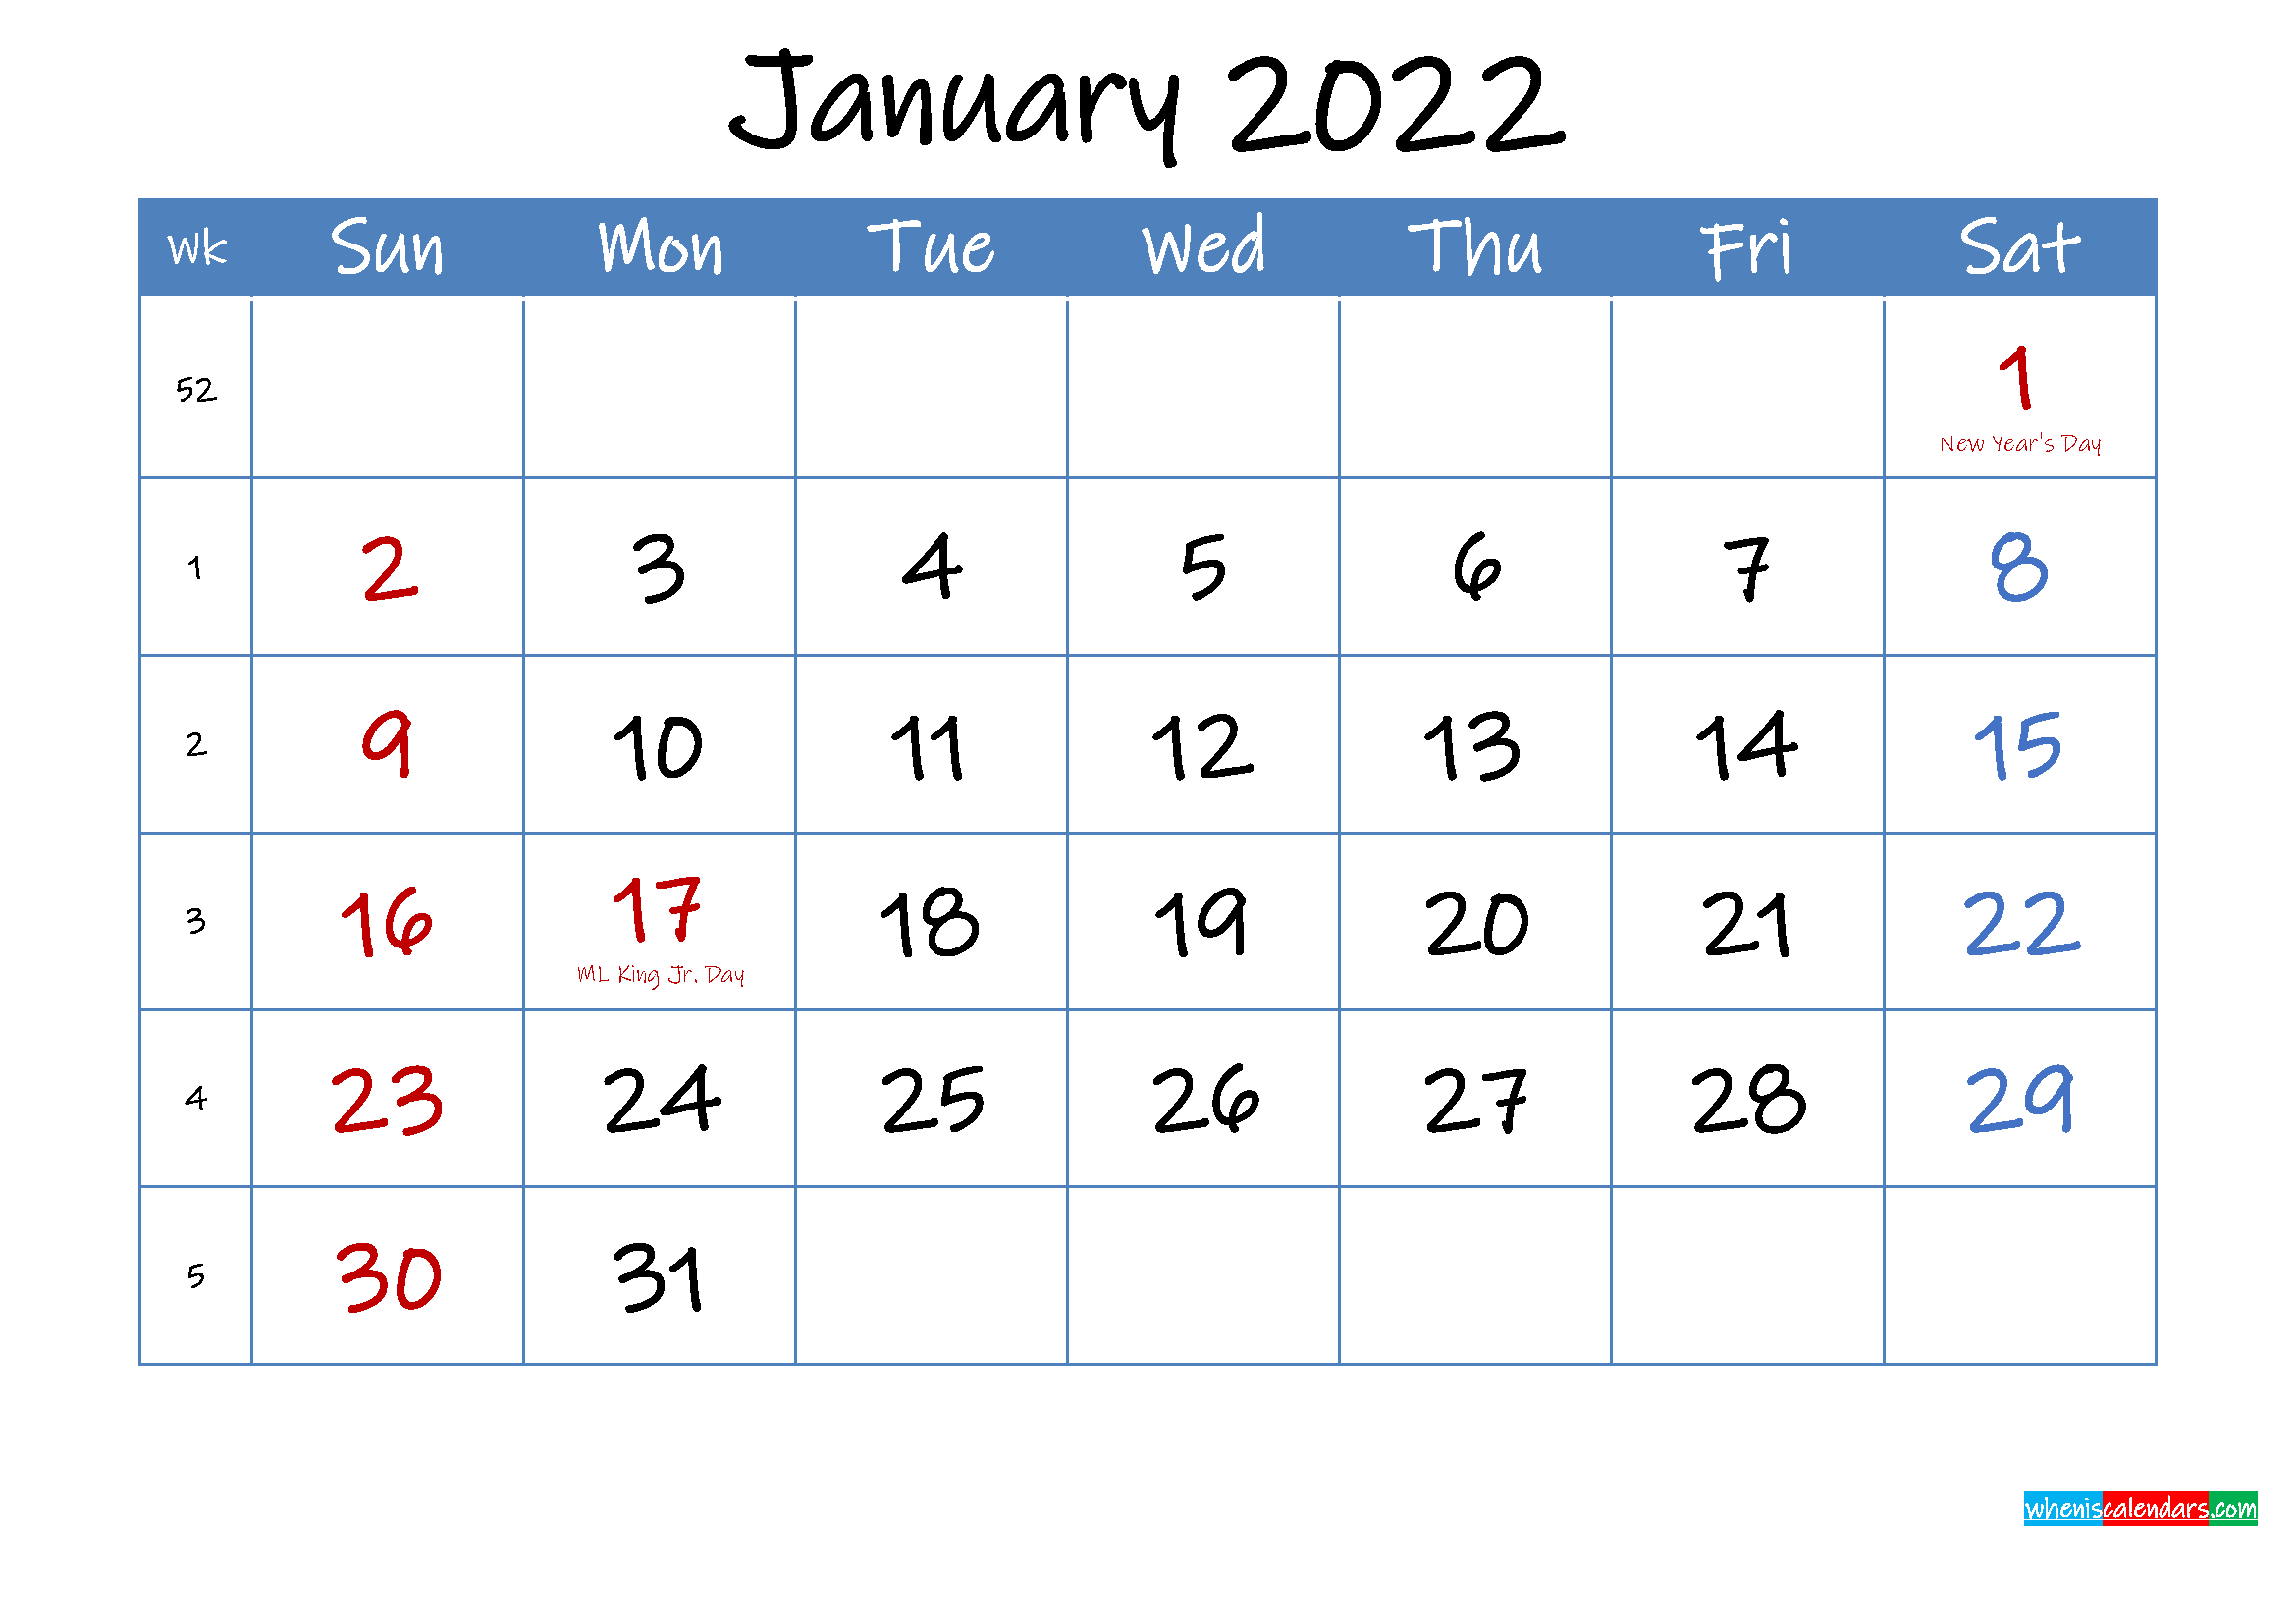 Printable January 2022 Calendar Word - Template Ink22M13 Inside Empty January 2022 Calendar